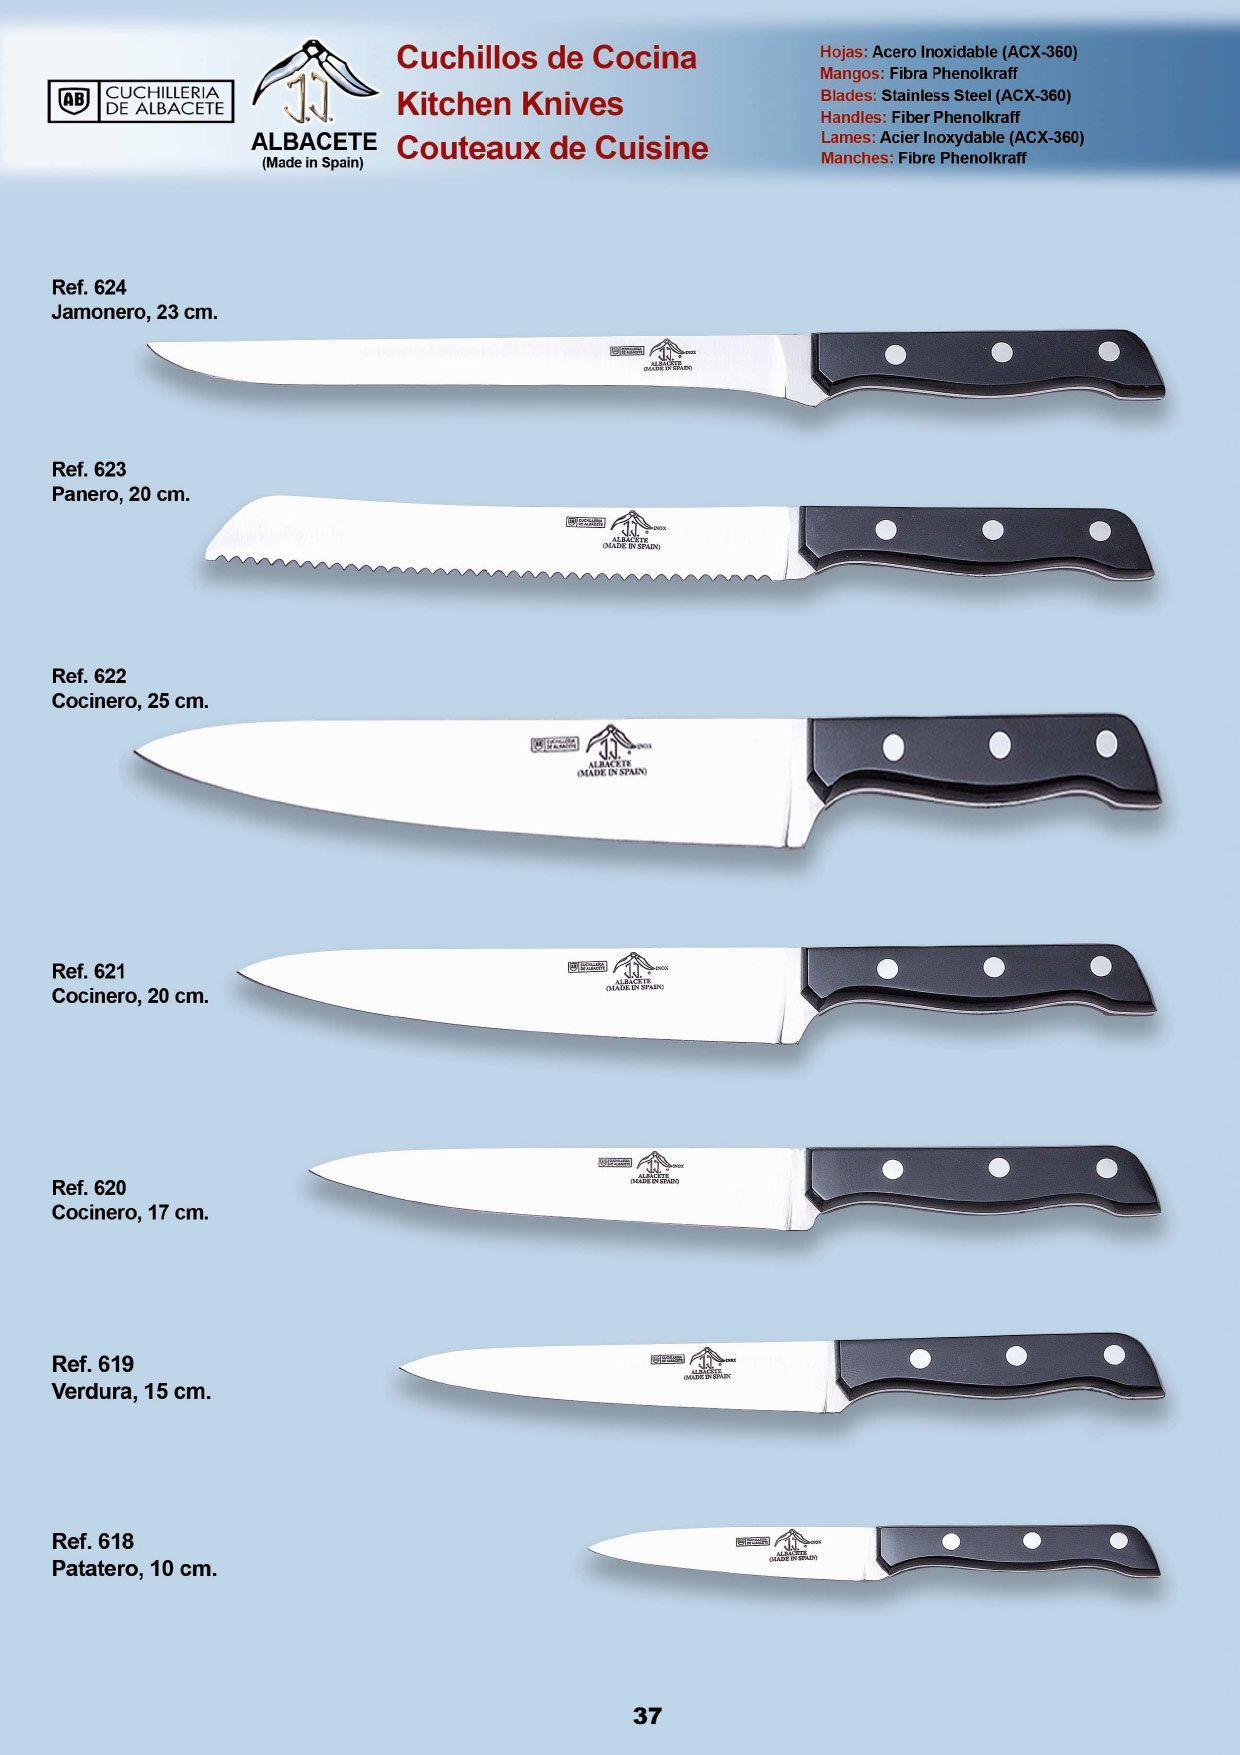 Menaje cocina cuchillos cocina cuchillos cocina 3 jj for Cuchillos cocina